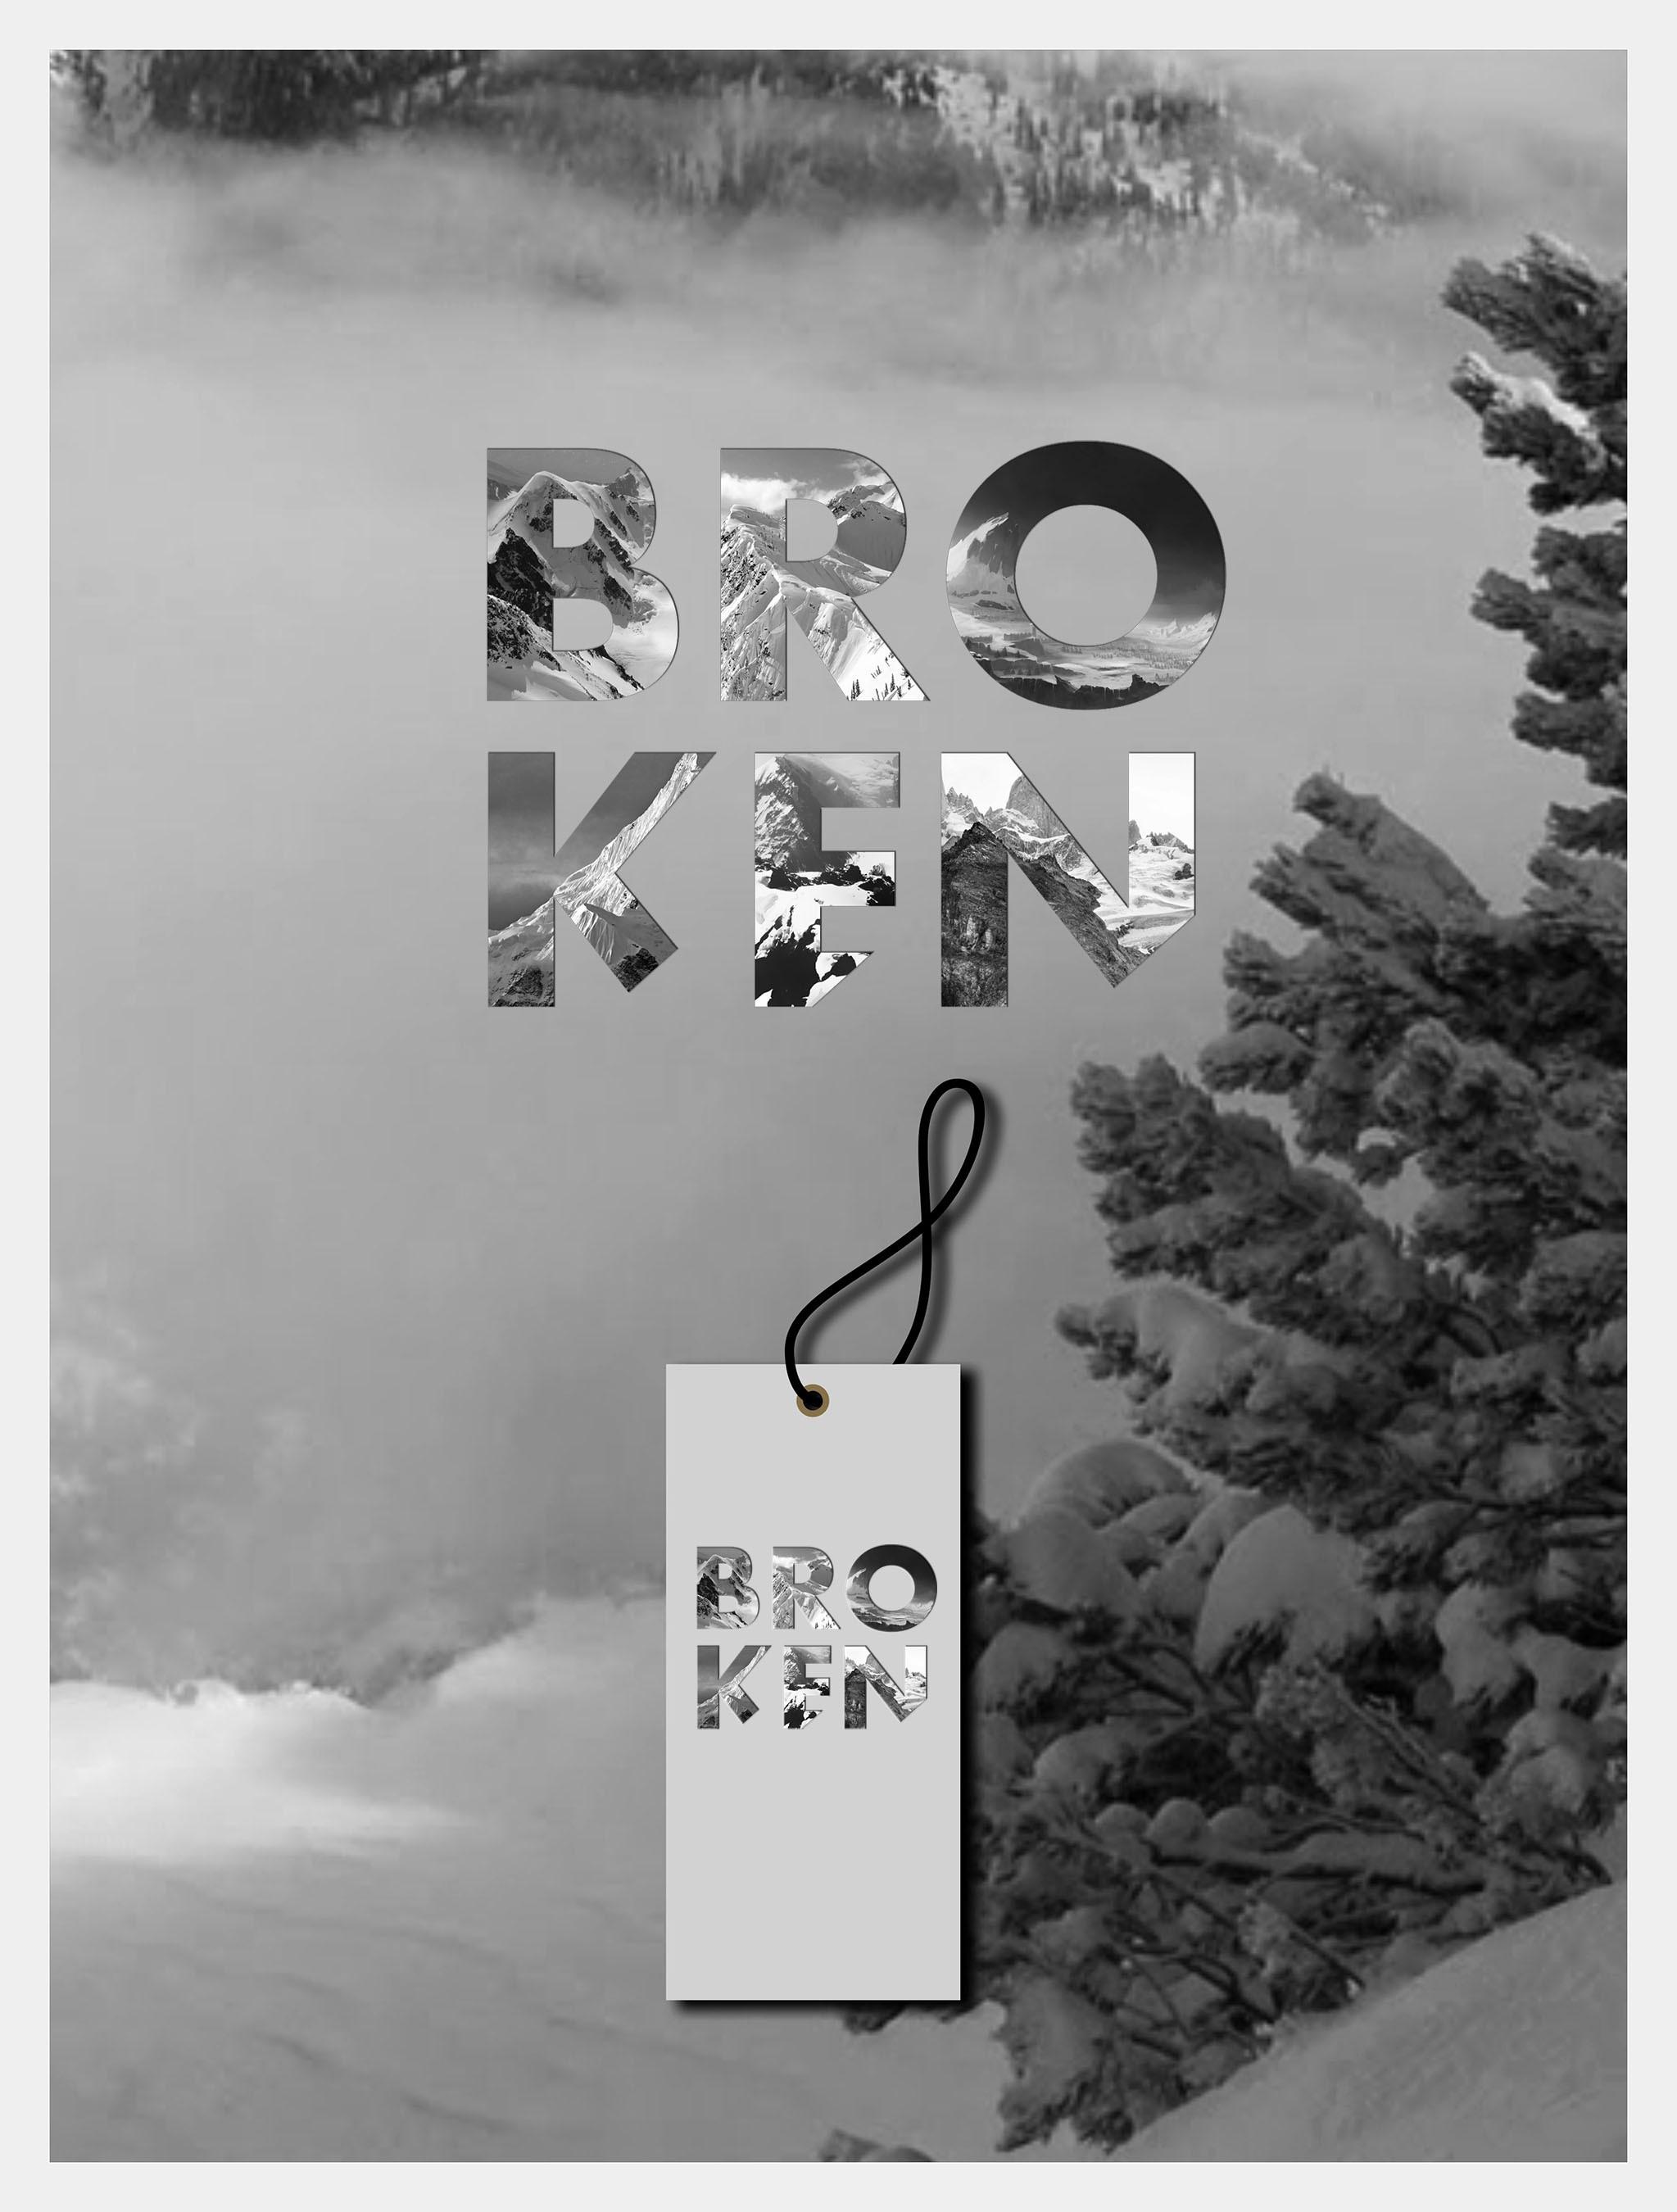 Create an eye-catching, memorable logo for Broken, LLC.